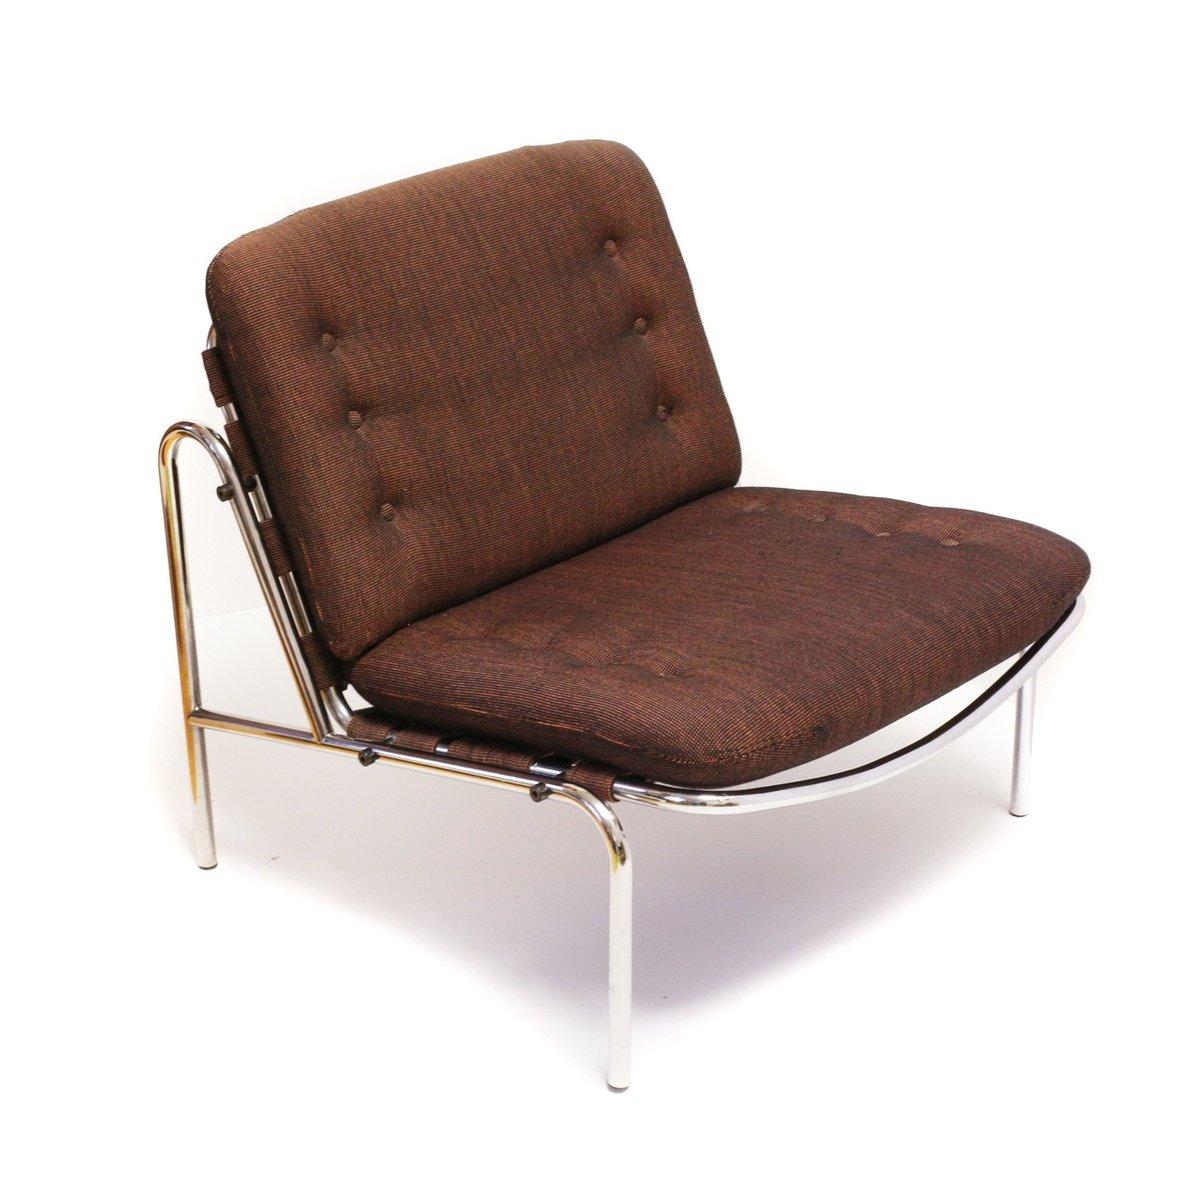 SZ Nagoya Industrial Mid Century Fauteuil By Martin Visser - Spectrum furniture